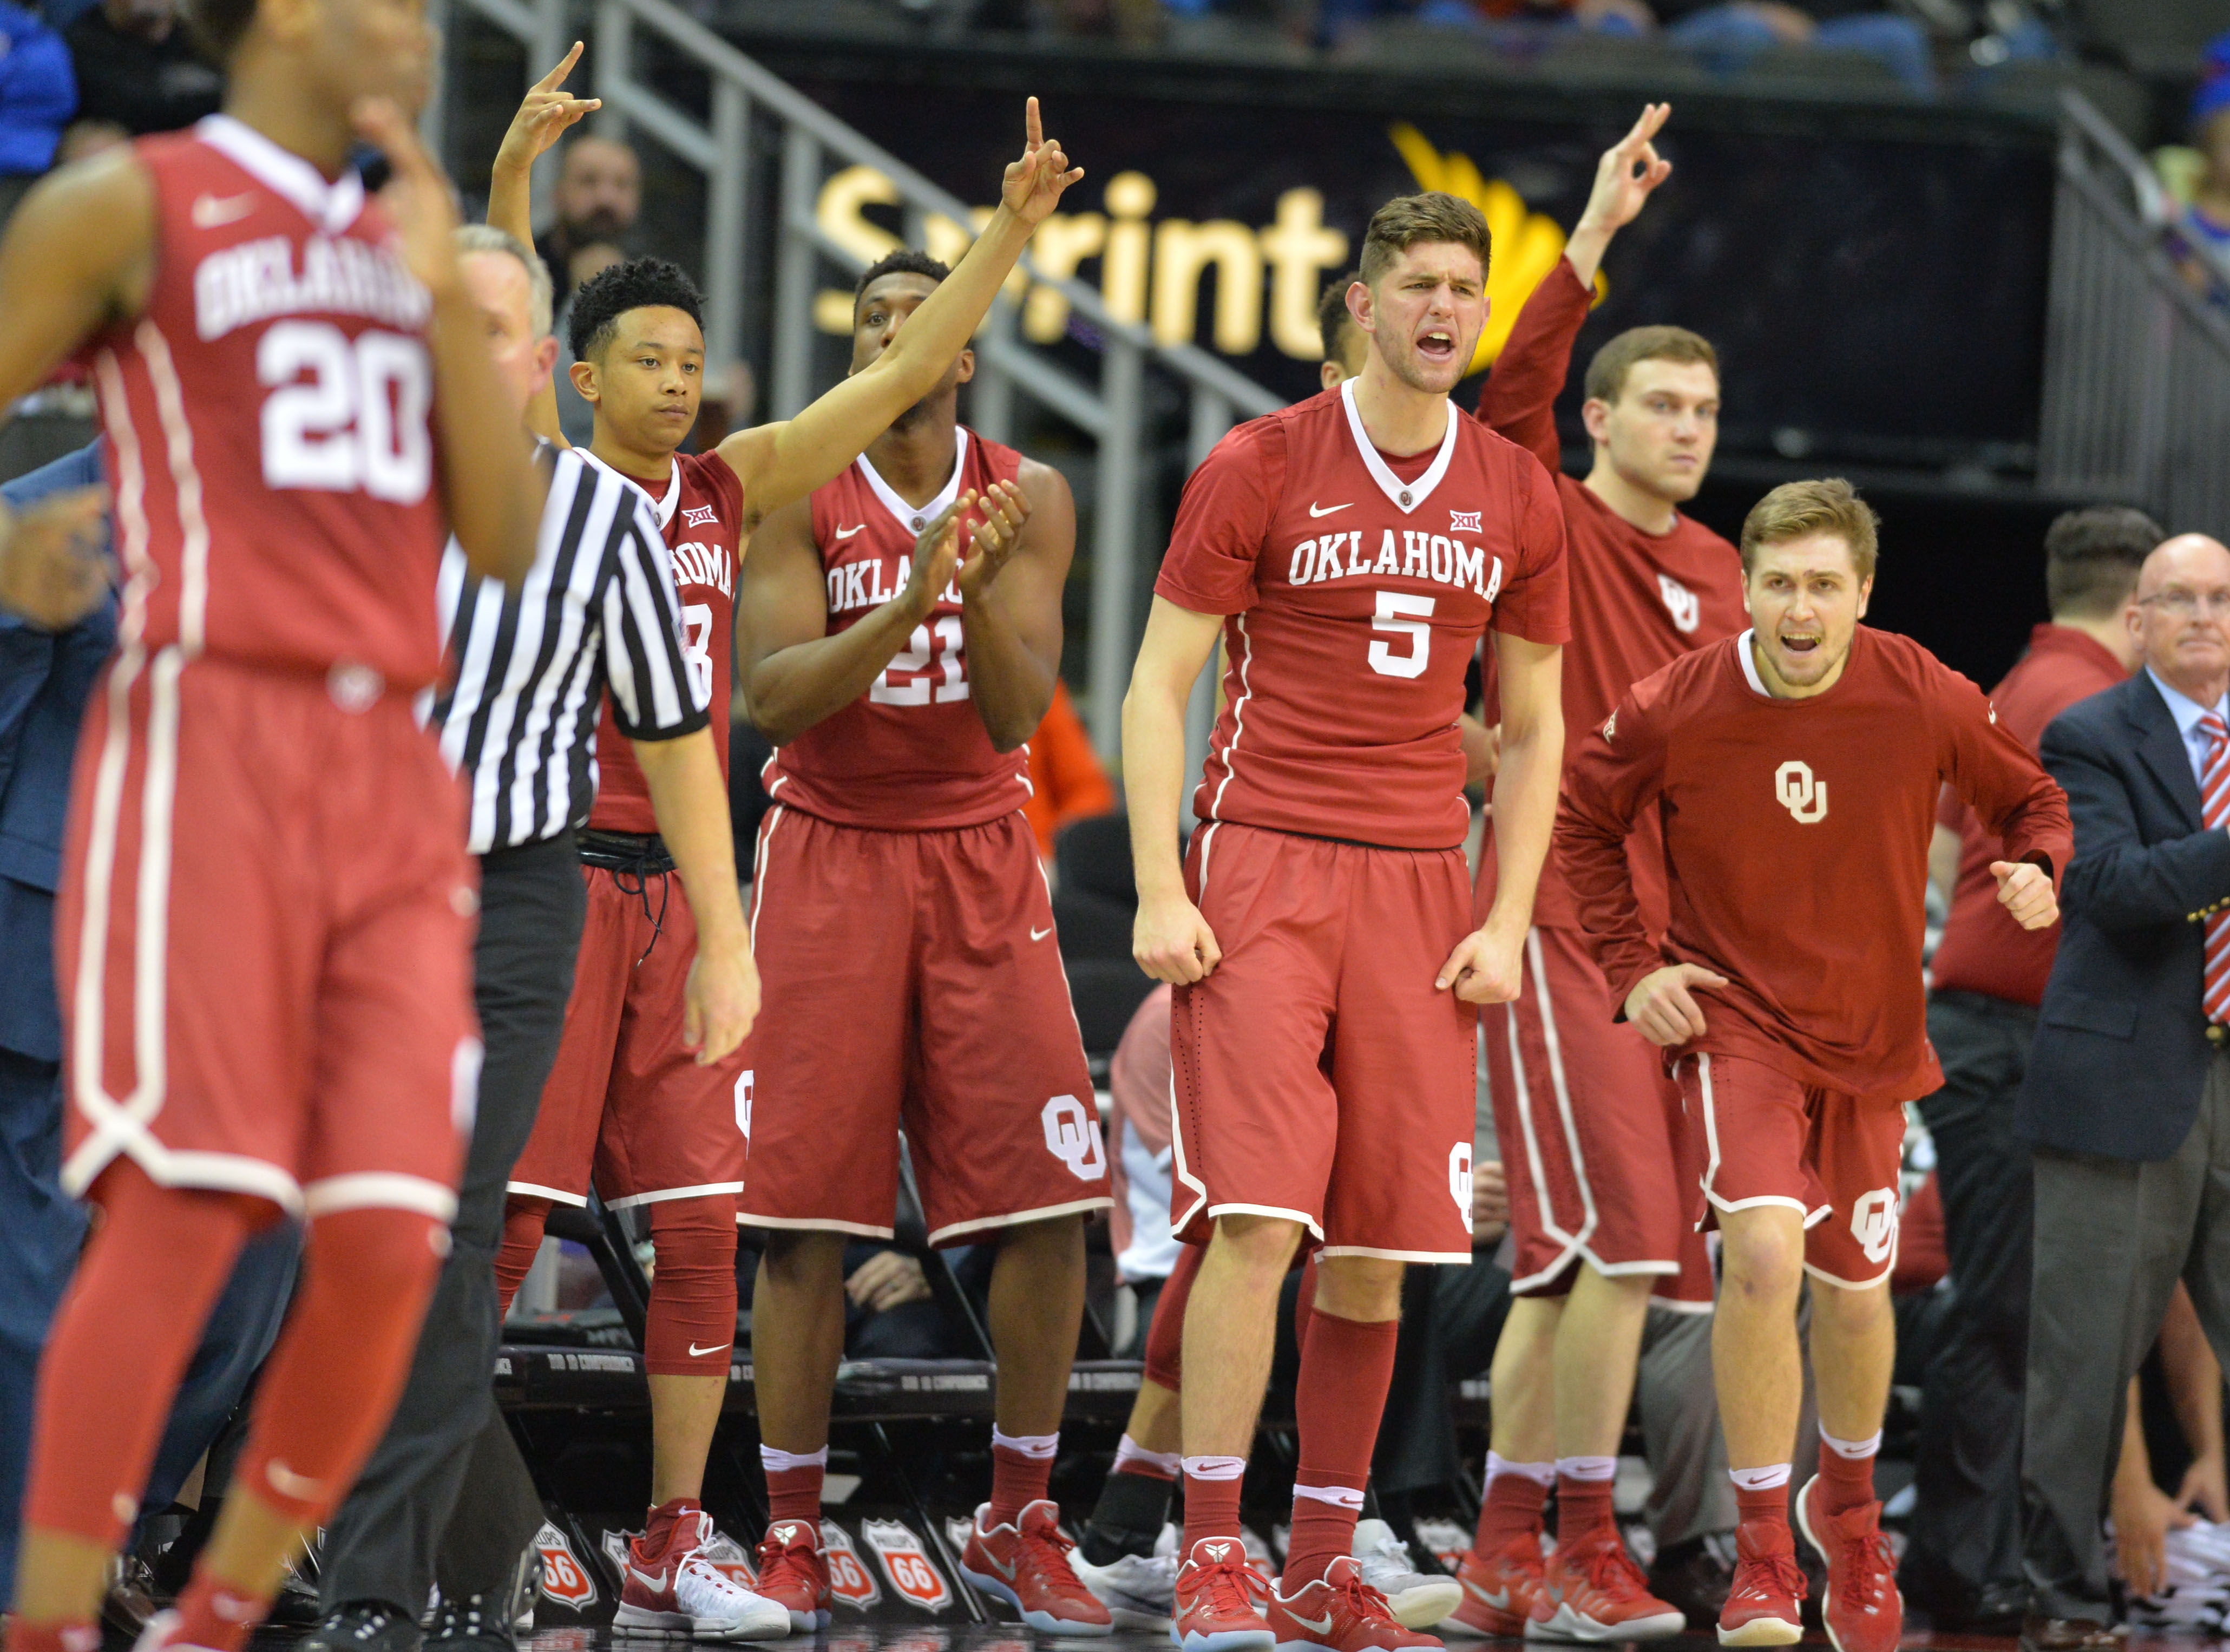 Oklahoma Basketball: What Some Are Saying About Next Season